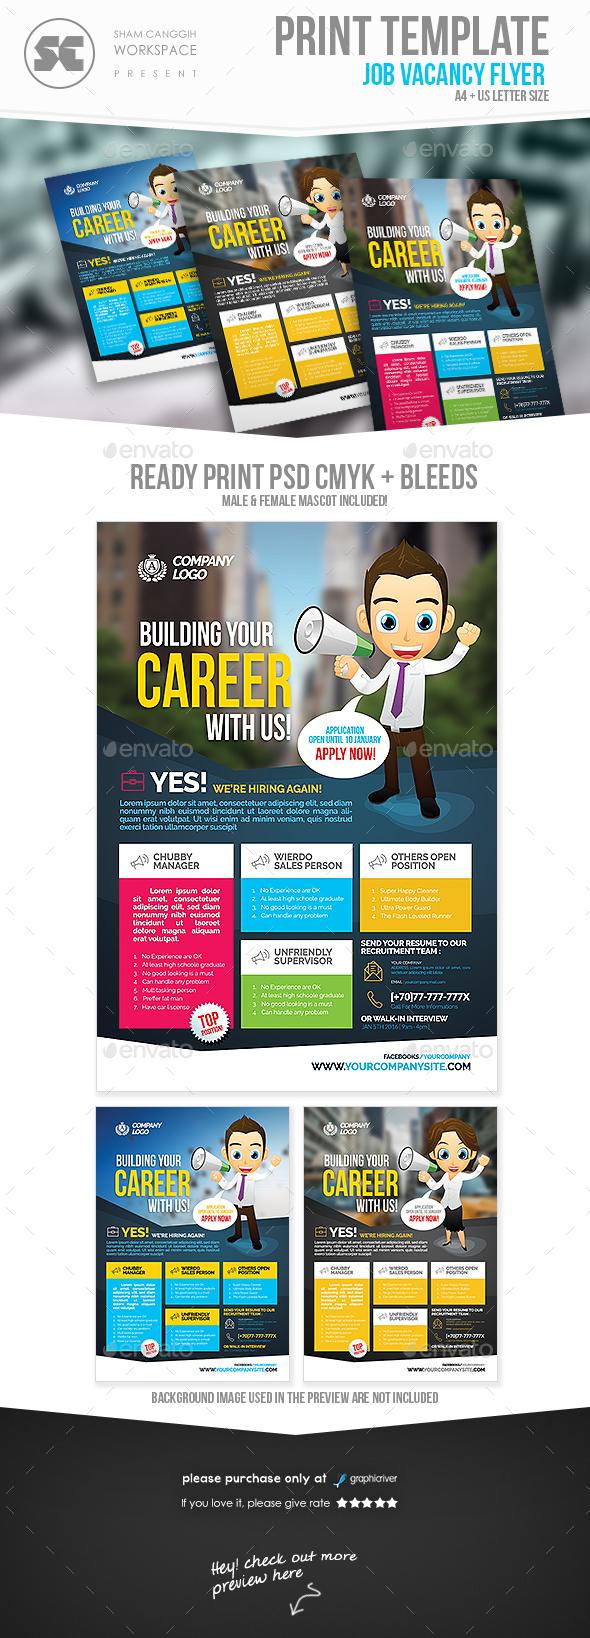 Job Flyer Kenindlecomfortzone